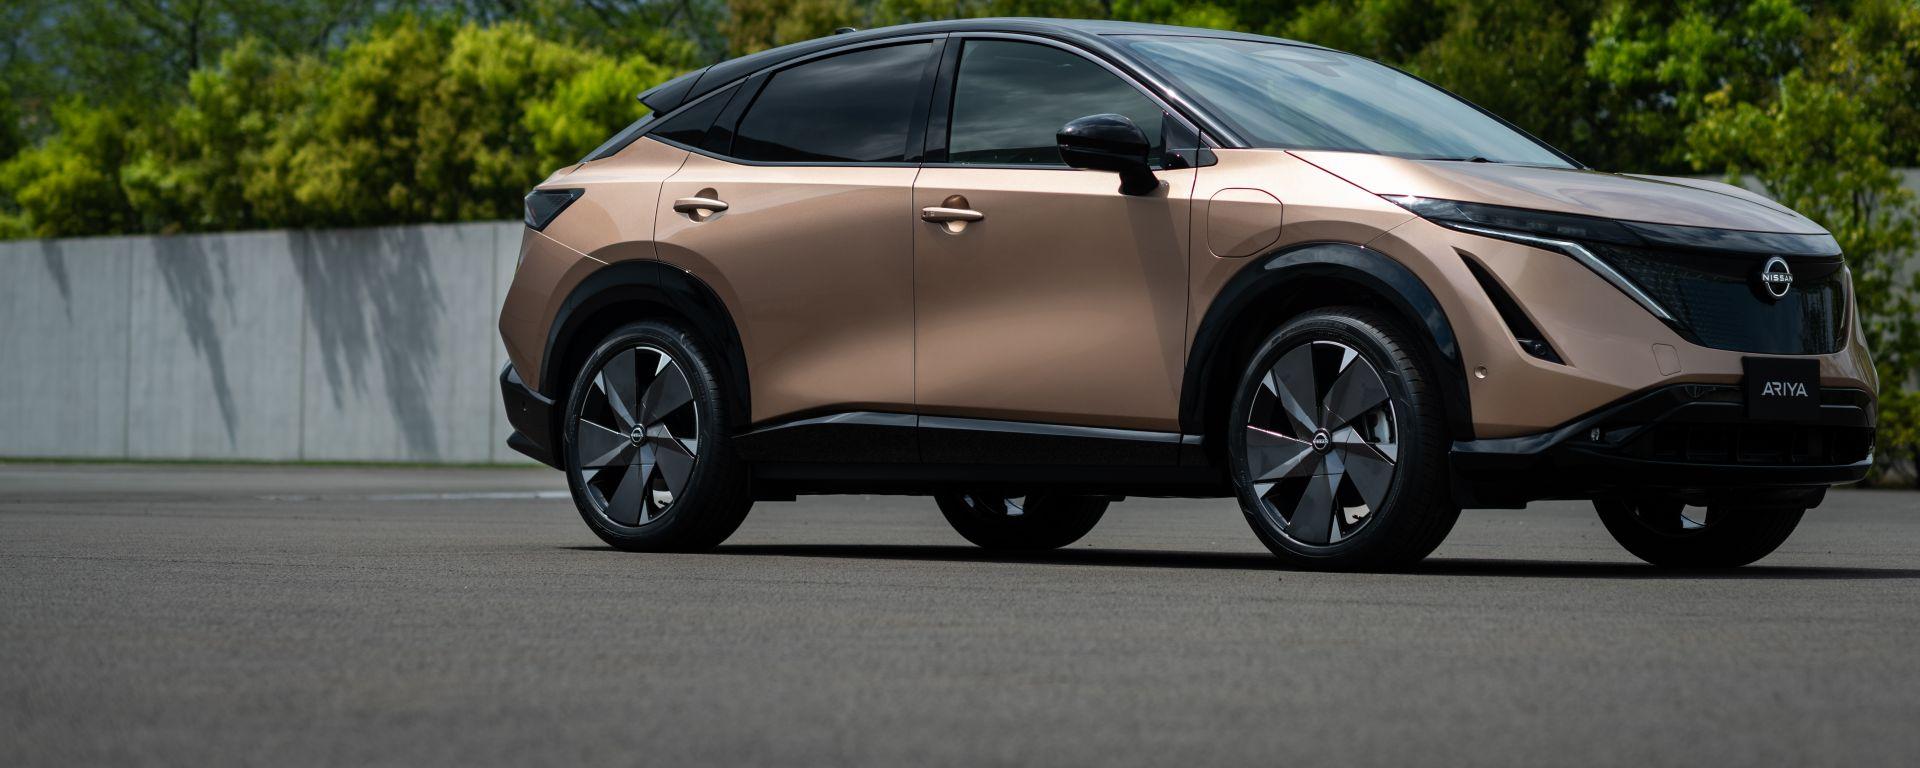 Nissan Ariya, debutto rimandato causa crisi seminconduttori